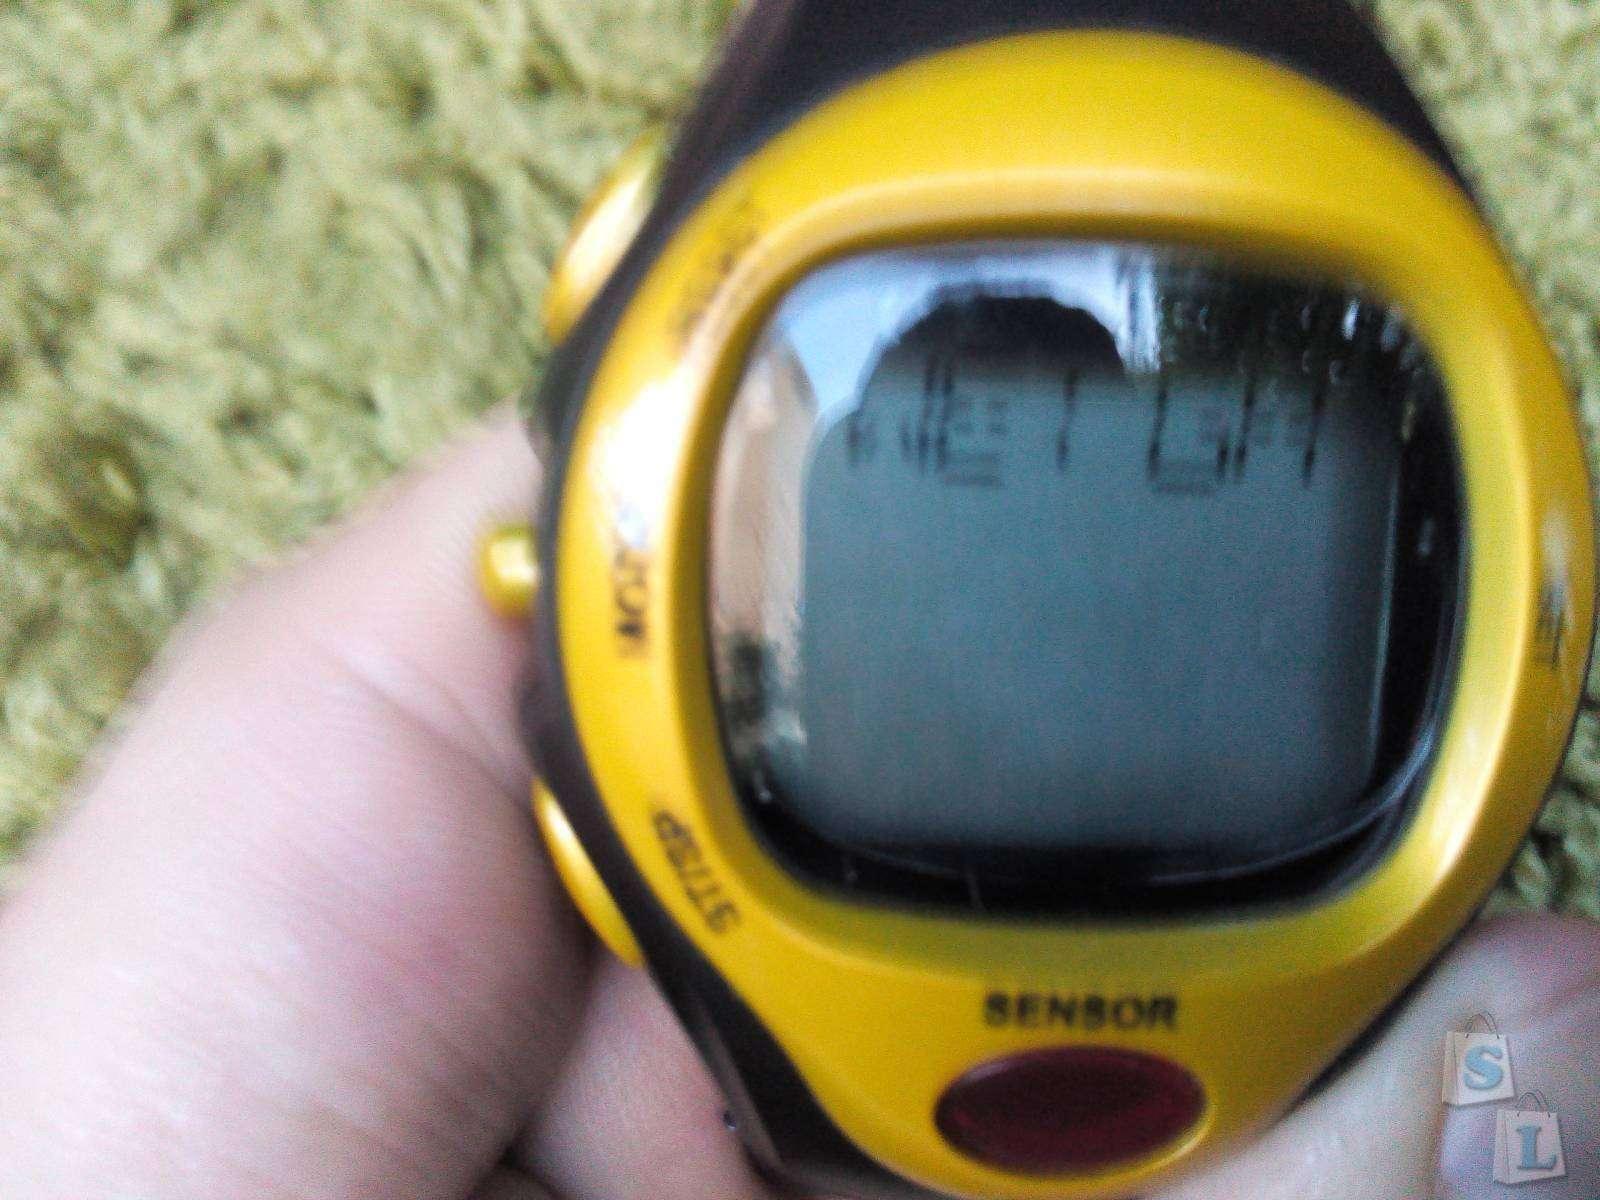 GearBest: Убер-смарт-часы с дисплеем, 'калориеметром' и пульсометром.